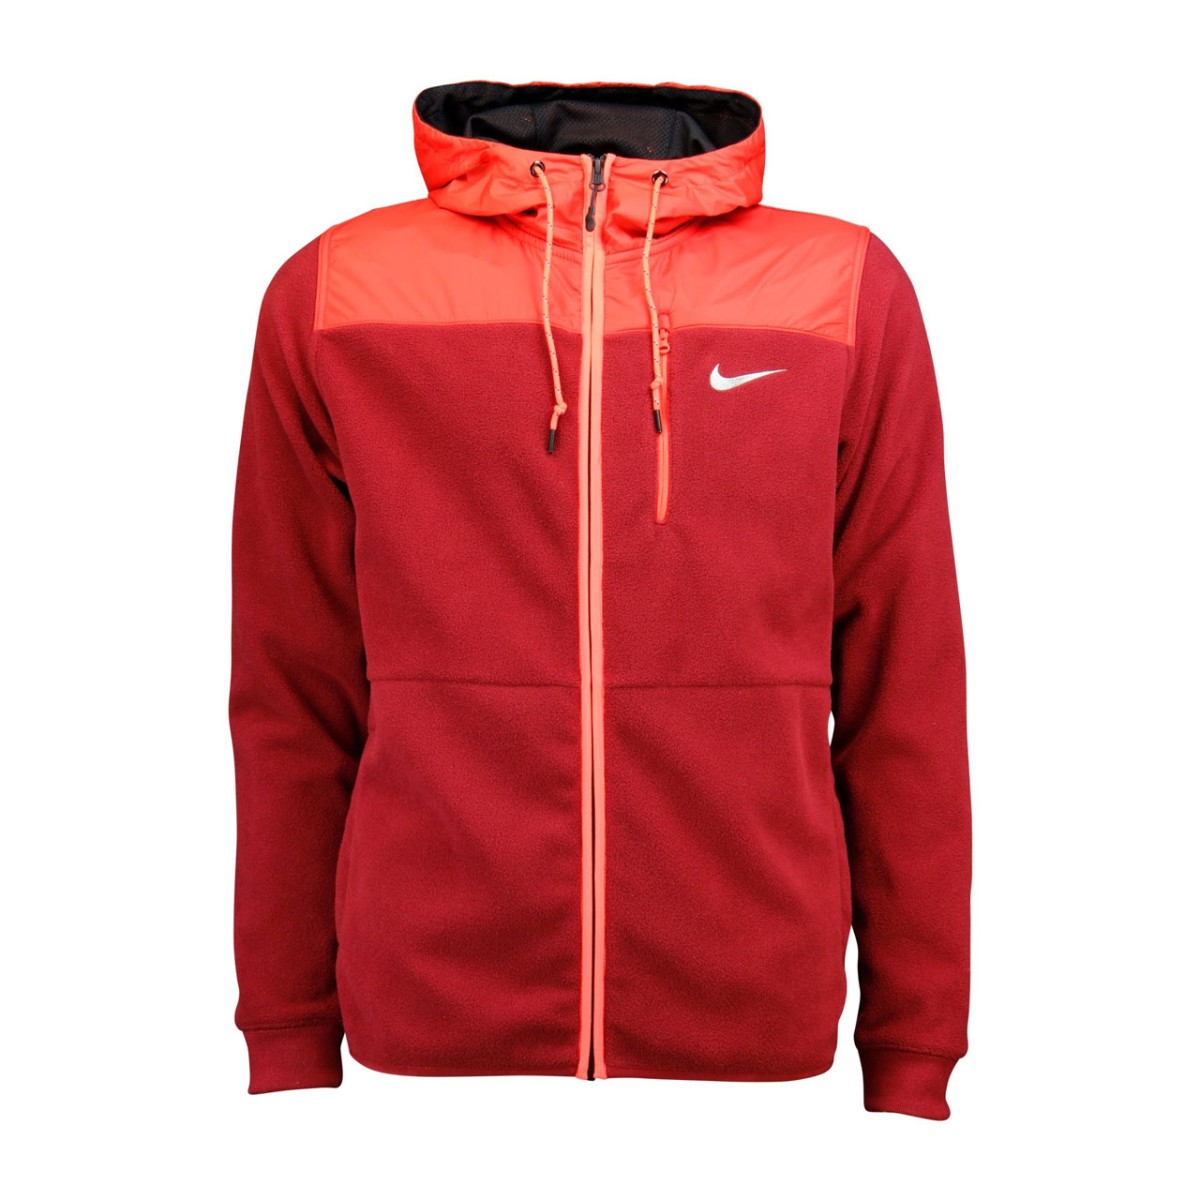 Colección Chaqueta Para Advanced Foot La Nike Winterised De rrFqwOnxYE